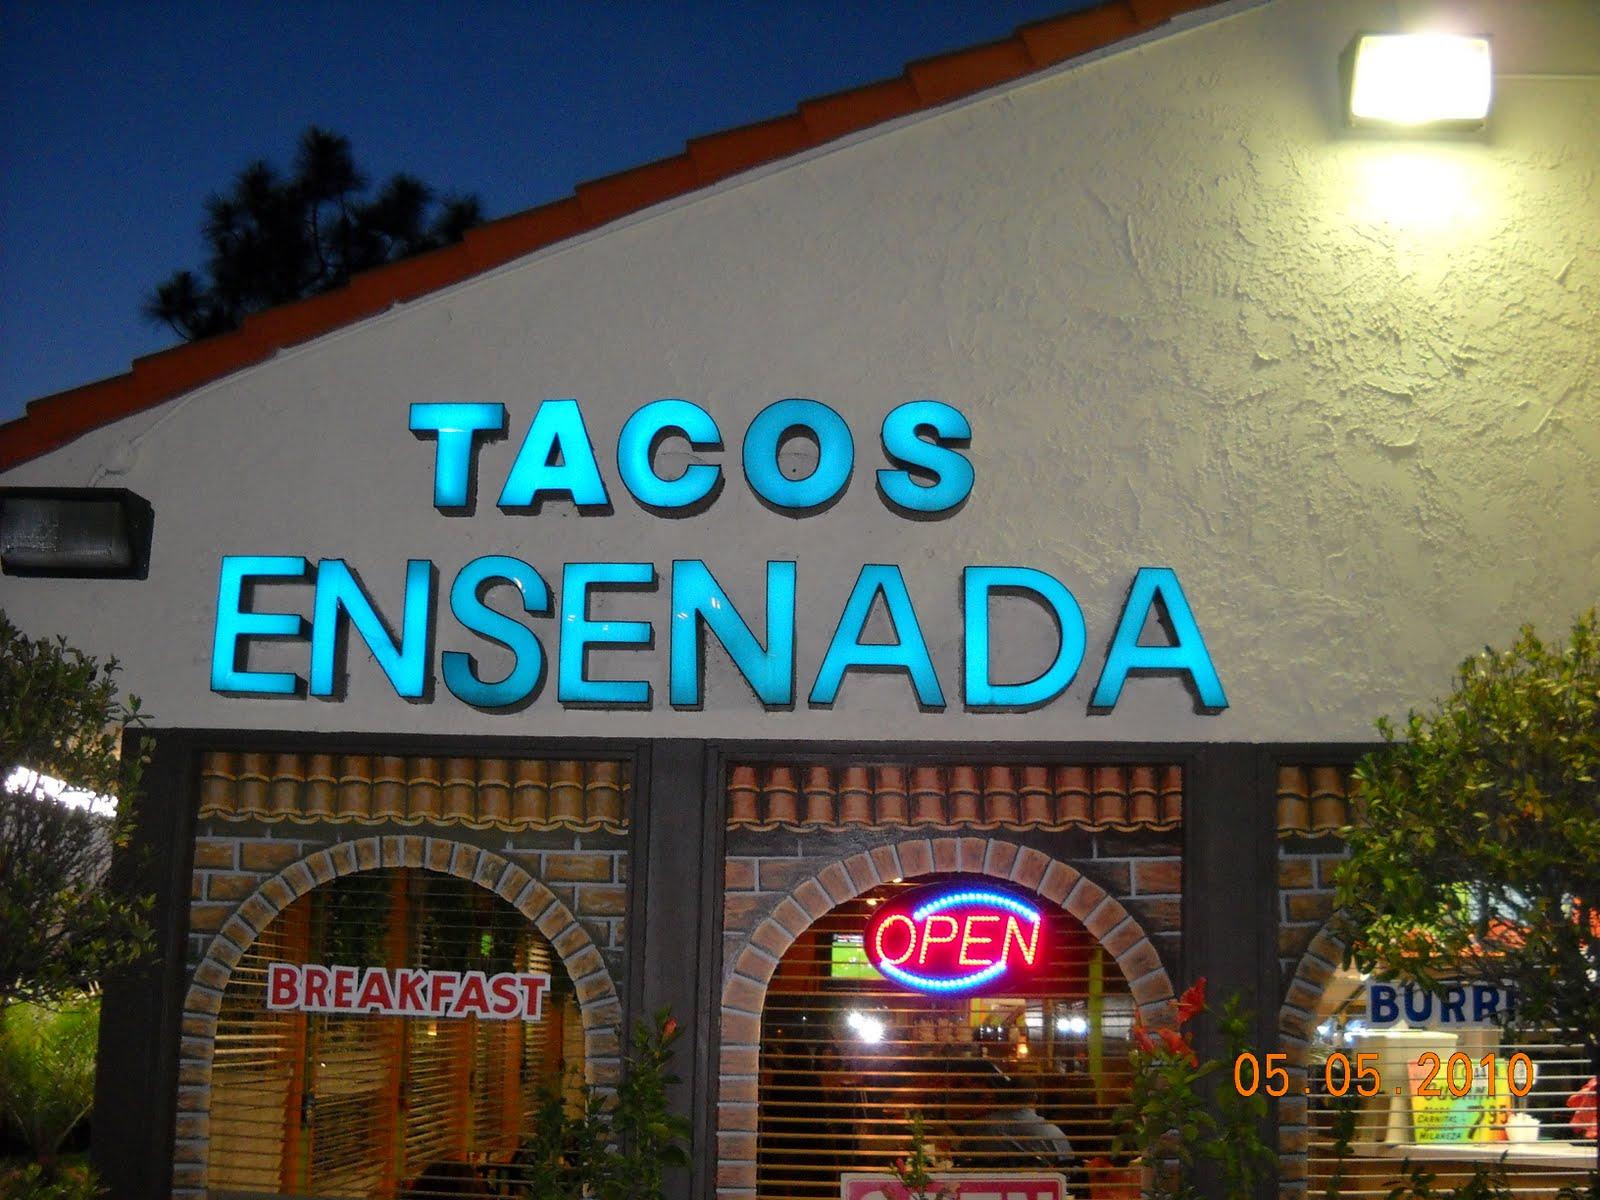 Eating My Way Through OC: Celebrating Cinco de Mayo at Tacos Ensenada